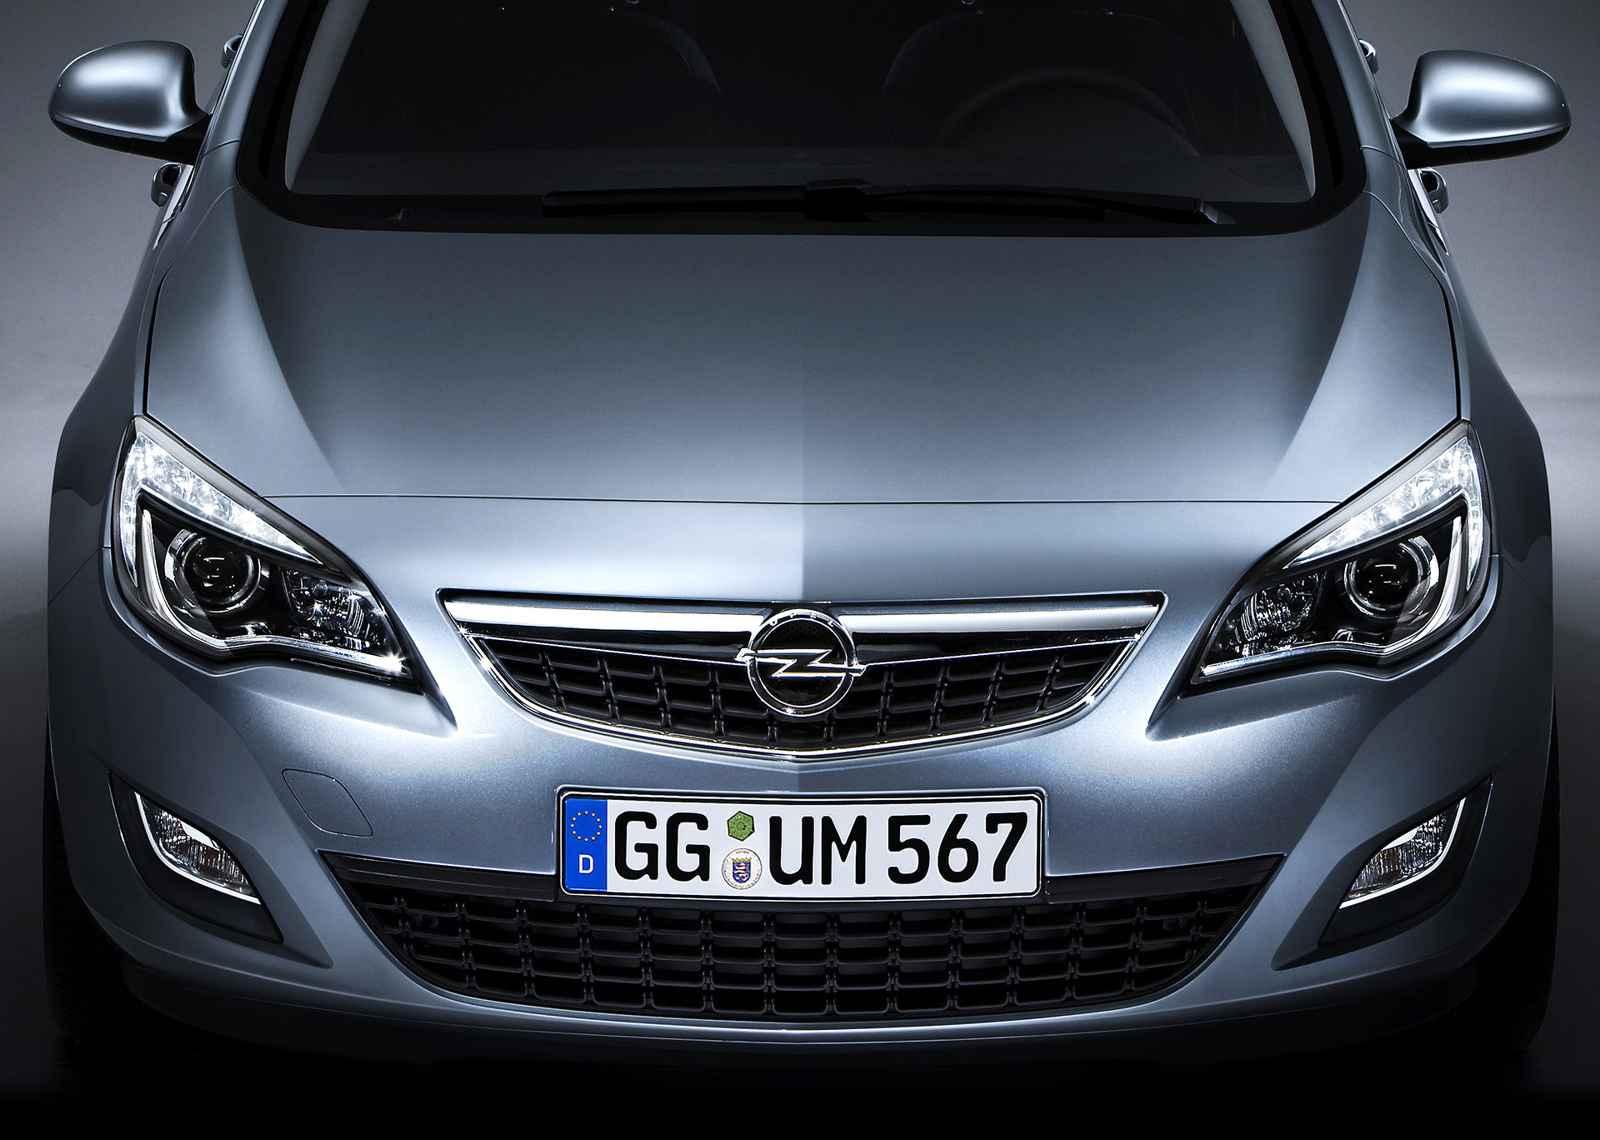 2018 Opel Astra Güncel Fiyatları | Uygun Taşıt